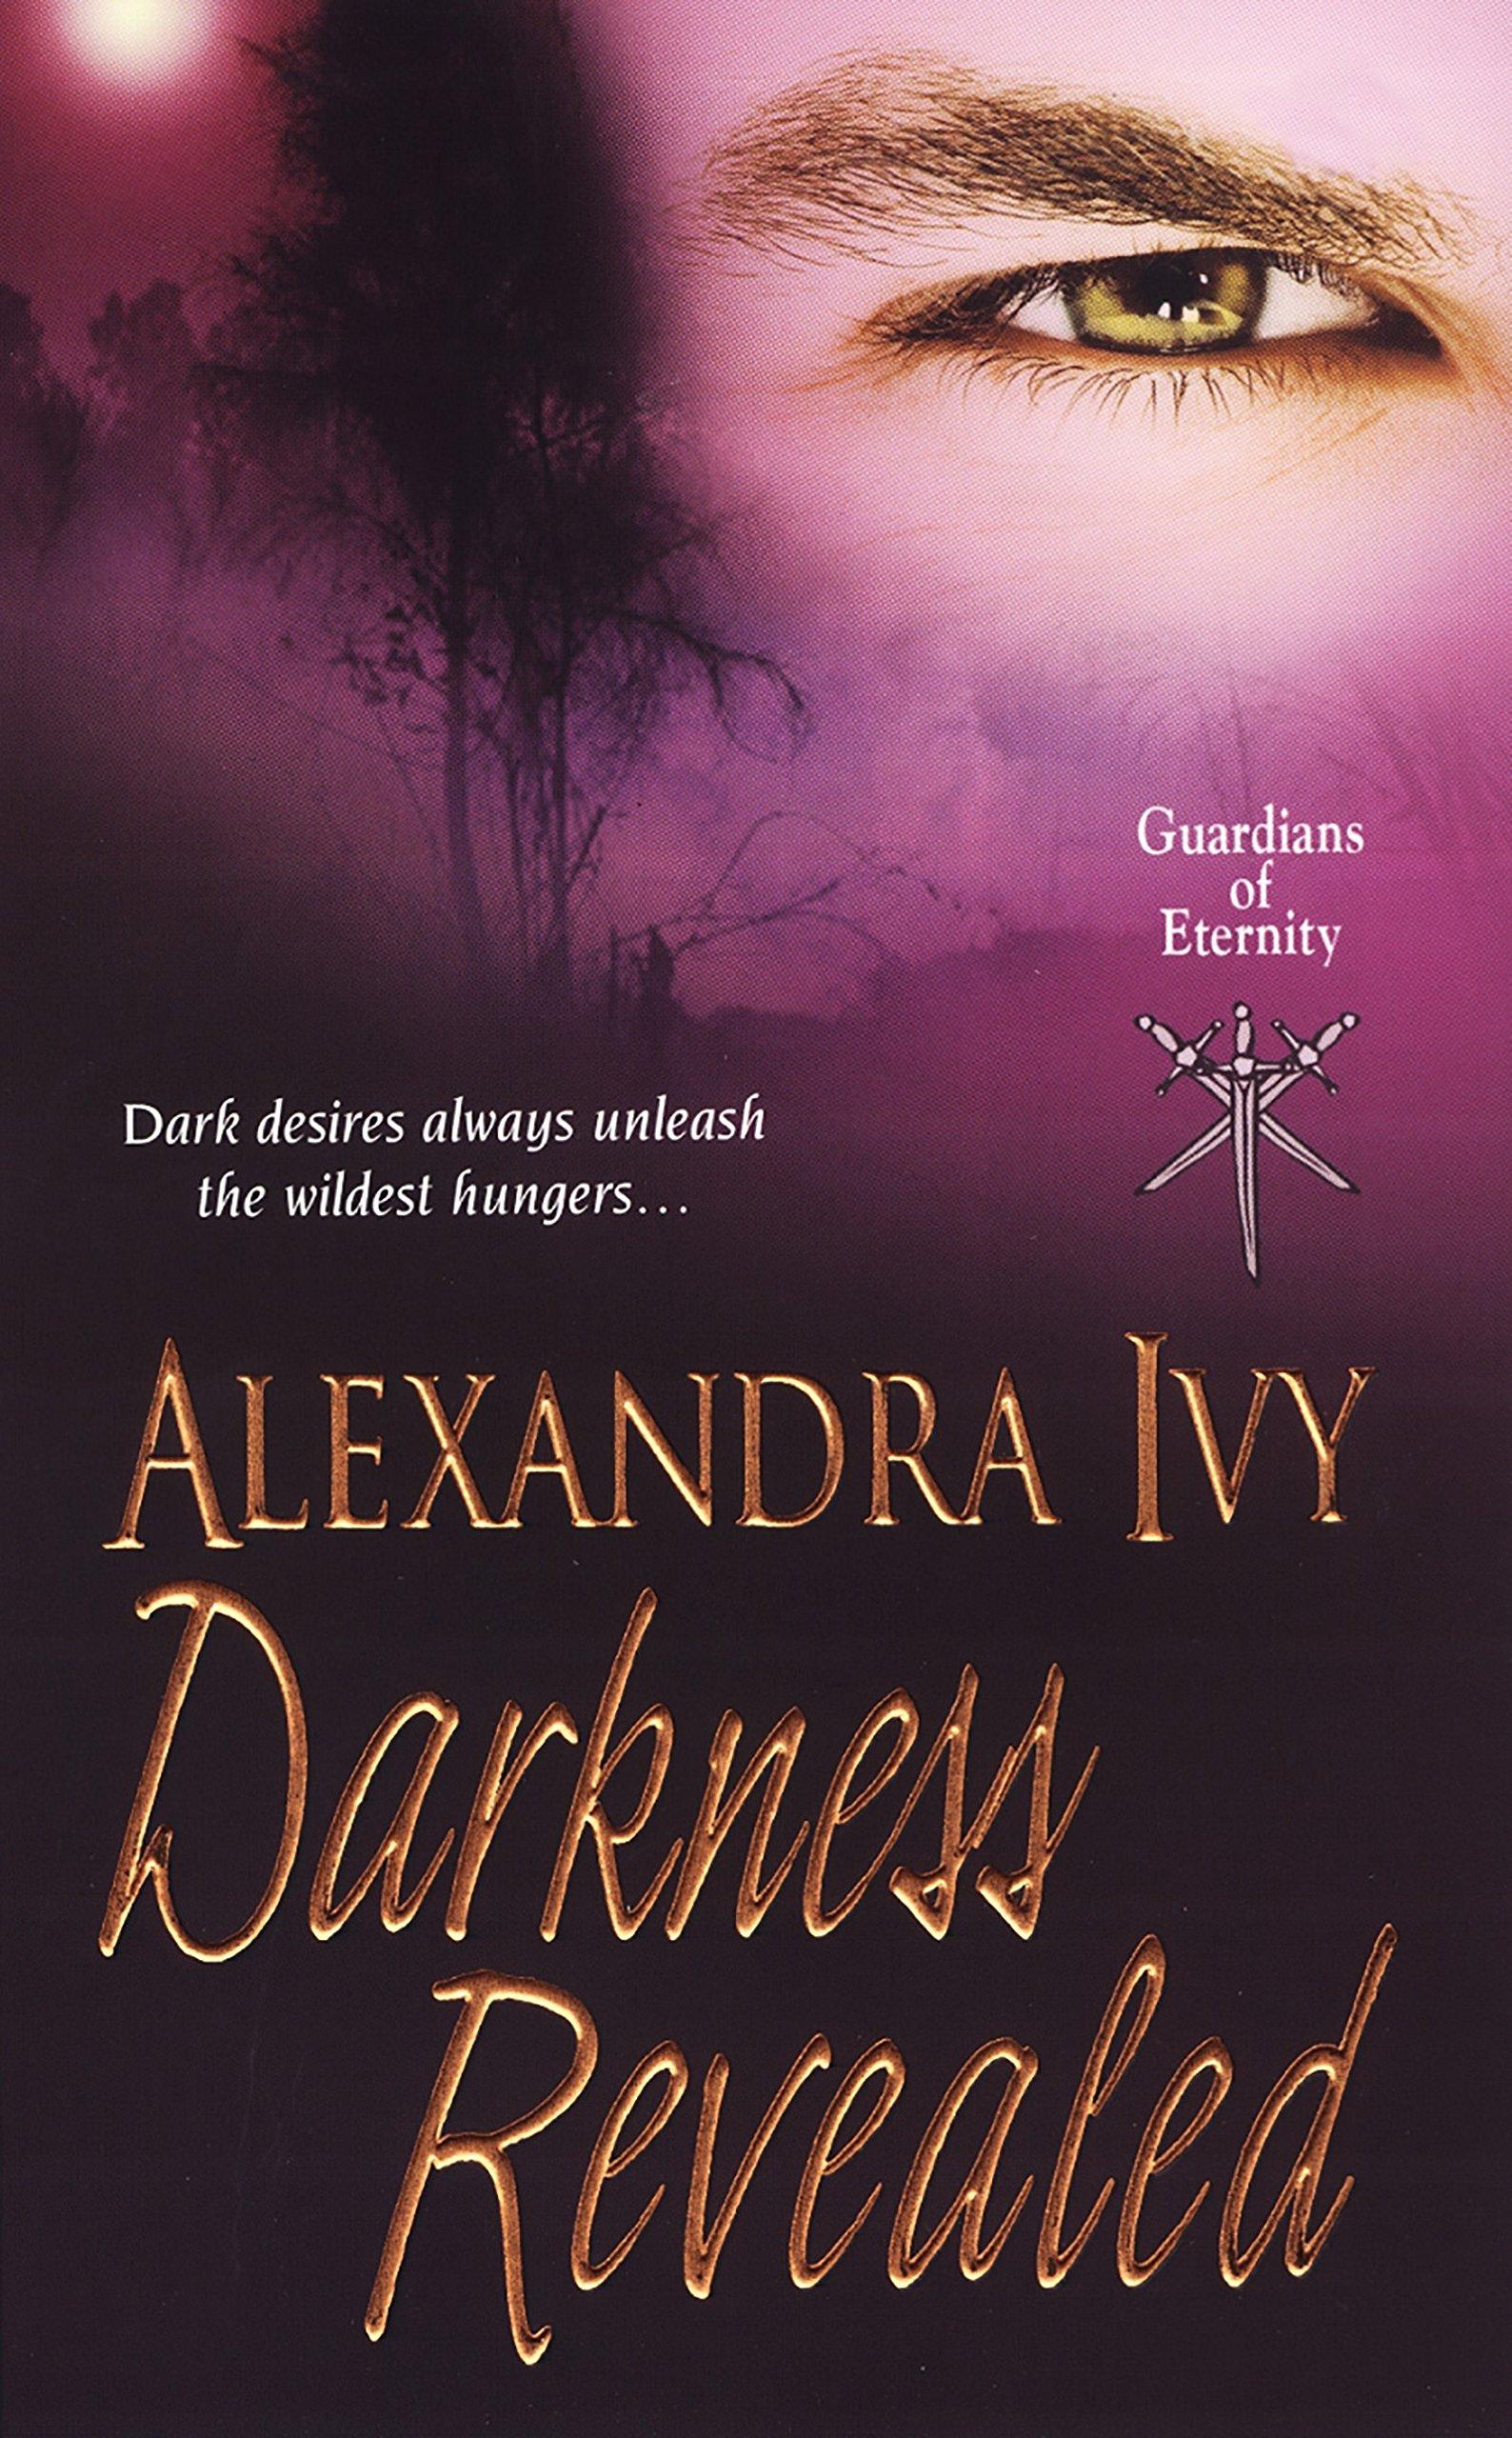 Alexandra Ivy: biography and creativity 75